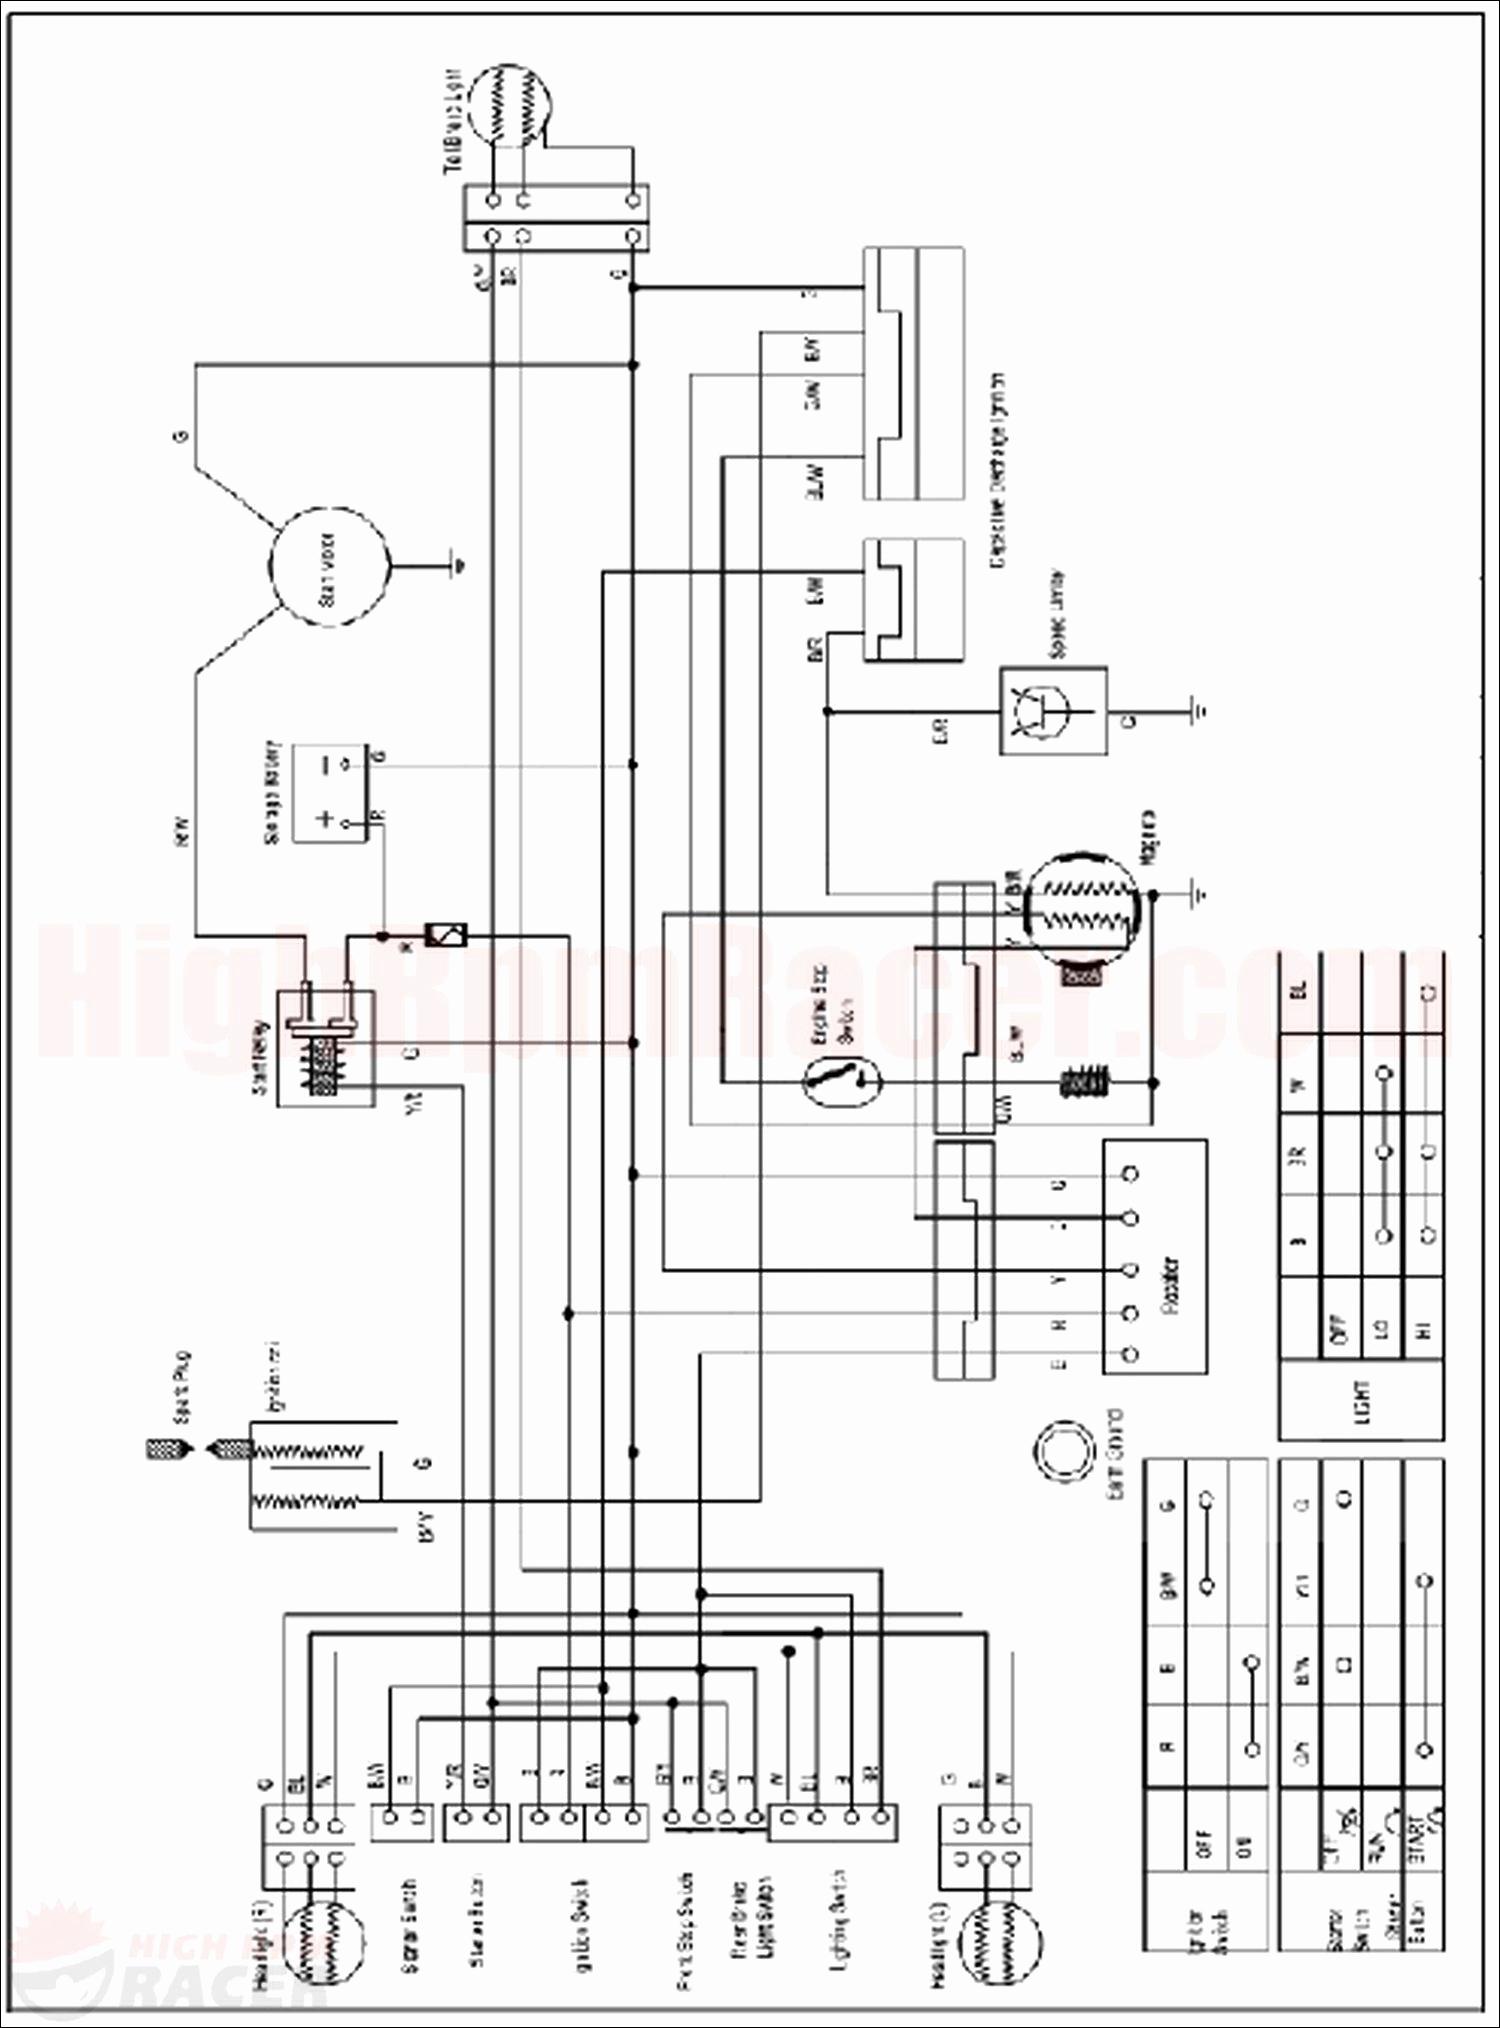 Chinese 125Cc Atv Wiring Diagram | Wirings Diagram on